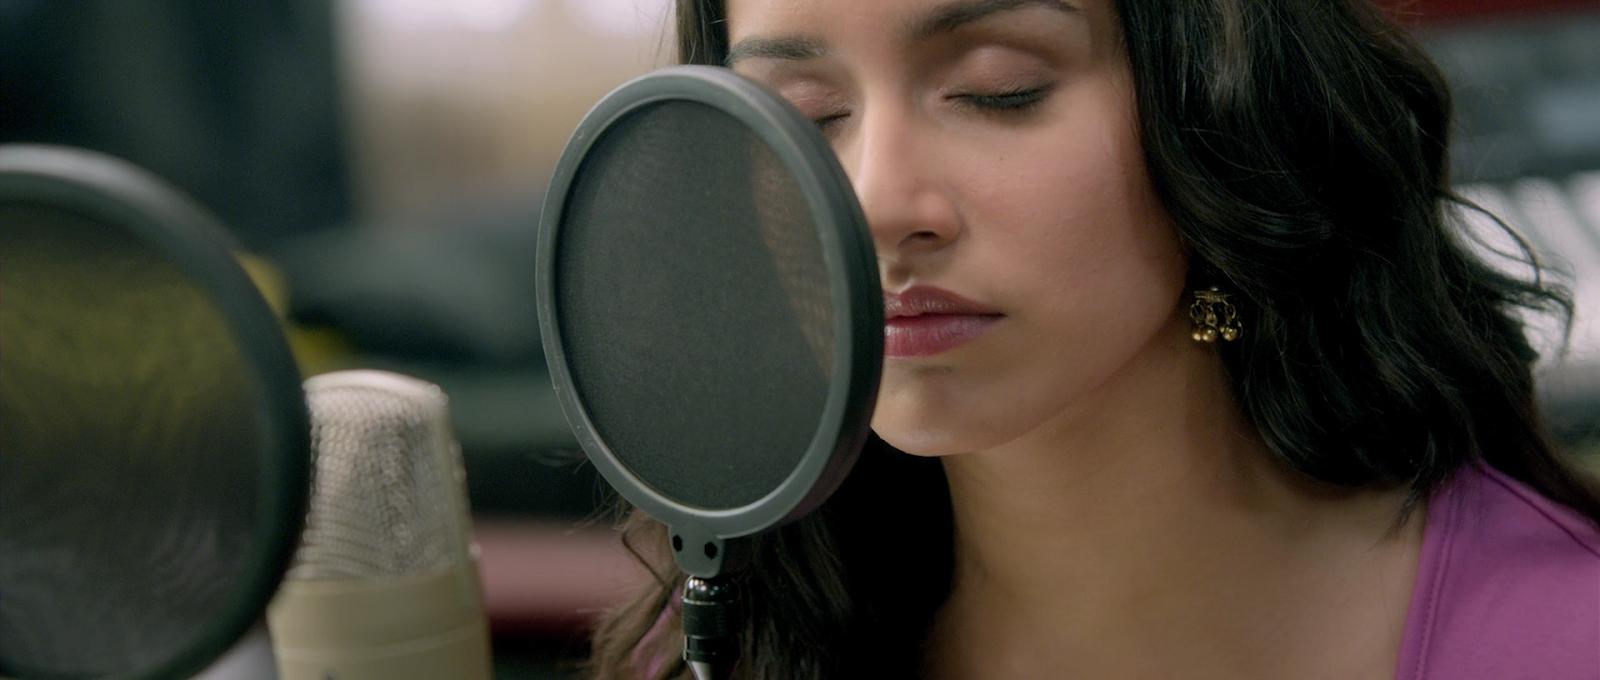 Aashiqui 2 Songs HD MP4 Videos Download - vdomp4.com